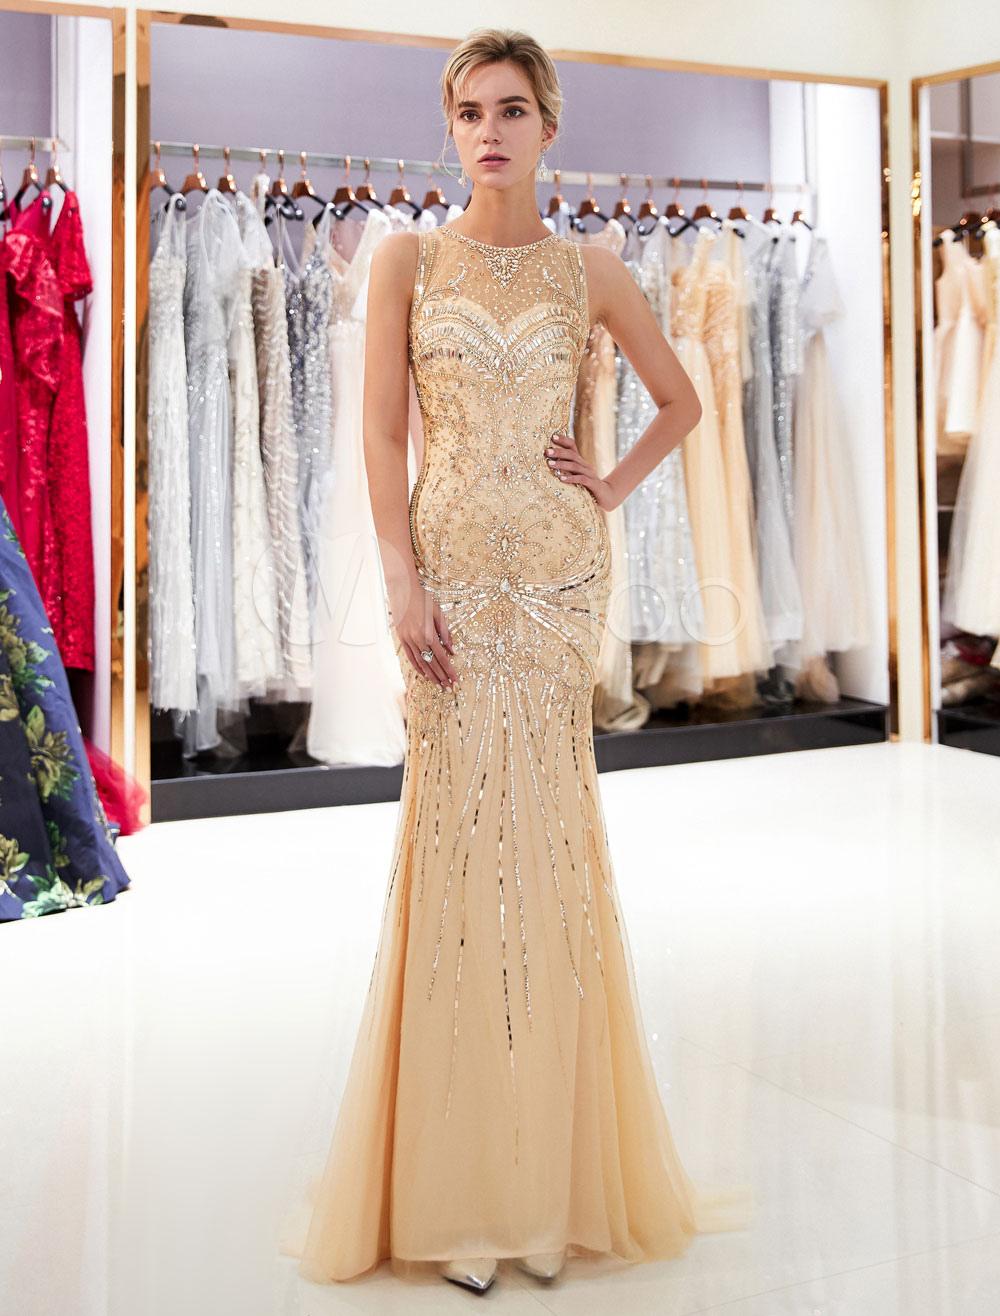 00ae4c5ea2e Mermaid Evening Dresses Light Gold Beaded Prom Dress Sleeveless ...